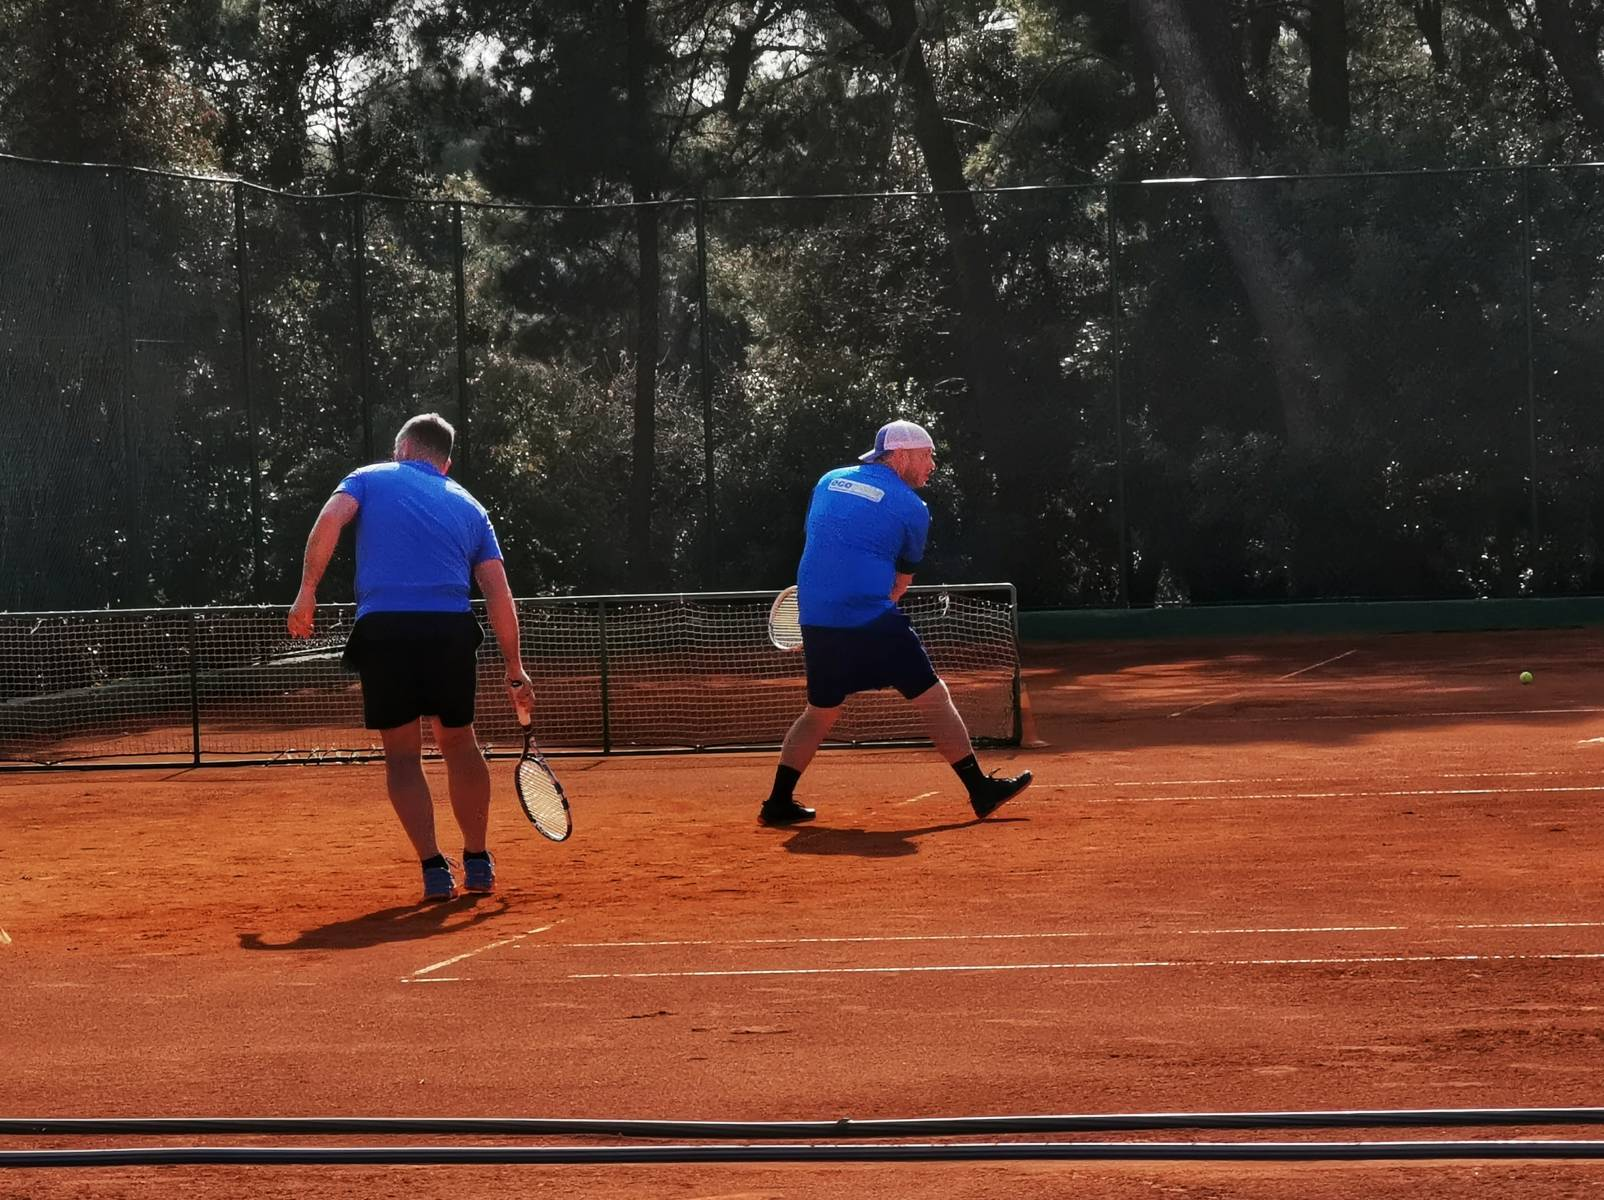 tennis-holidays-croatia-2019-27.jpeg